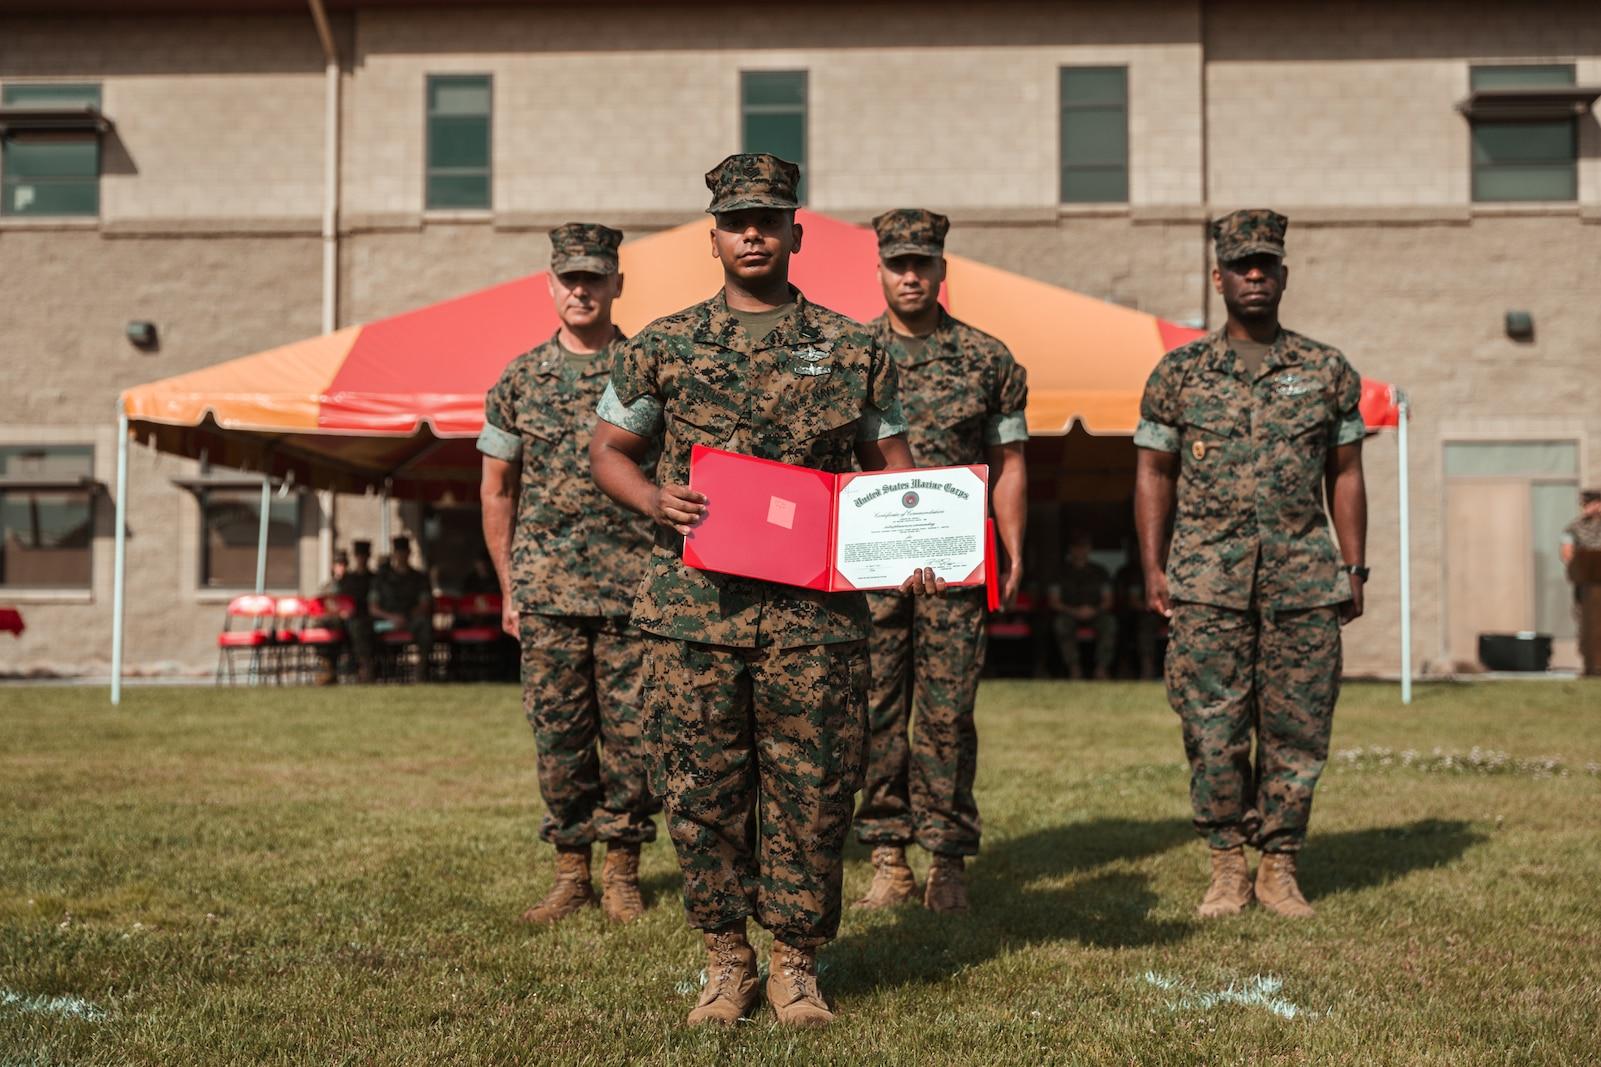 U.S. Navy Hospitalman Michael W. Baker received the Bluejacket of the Quarter Award.